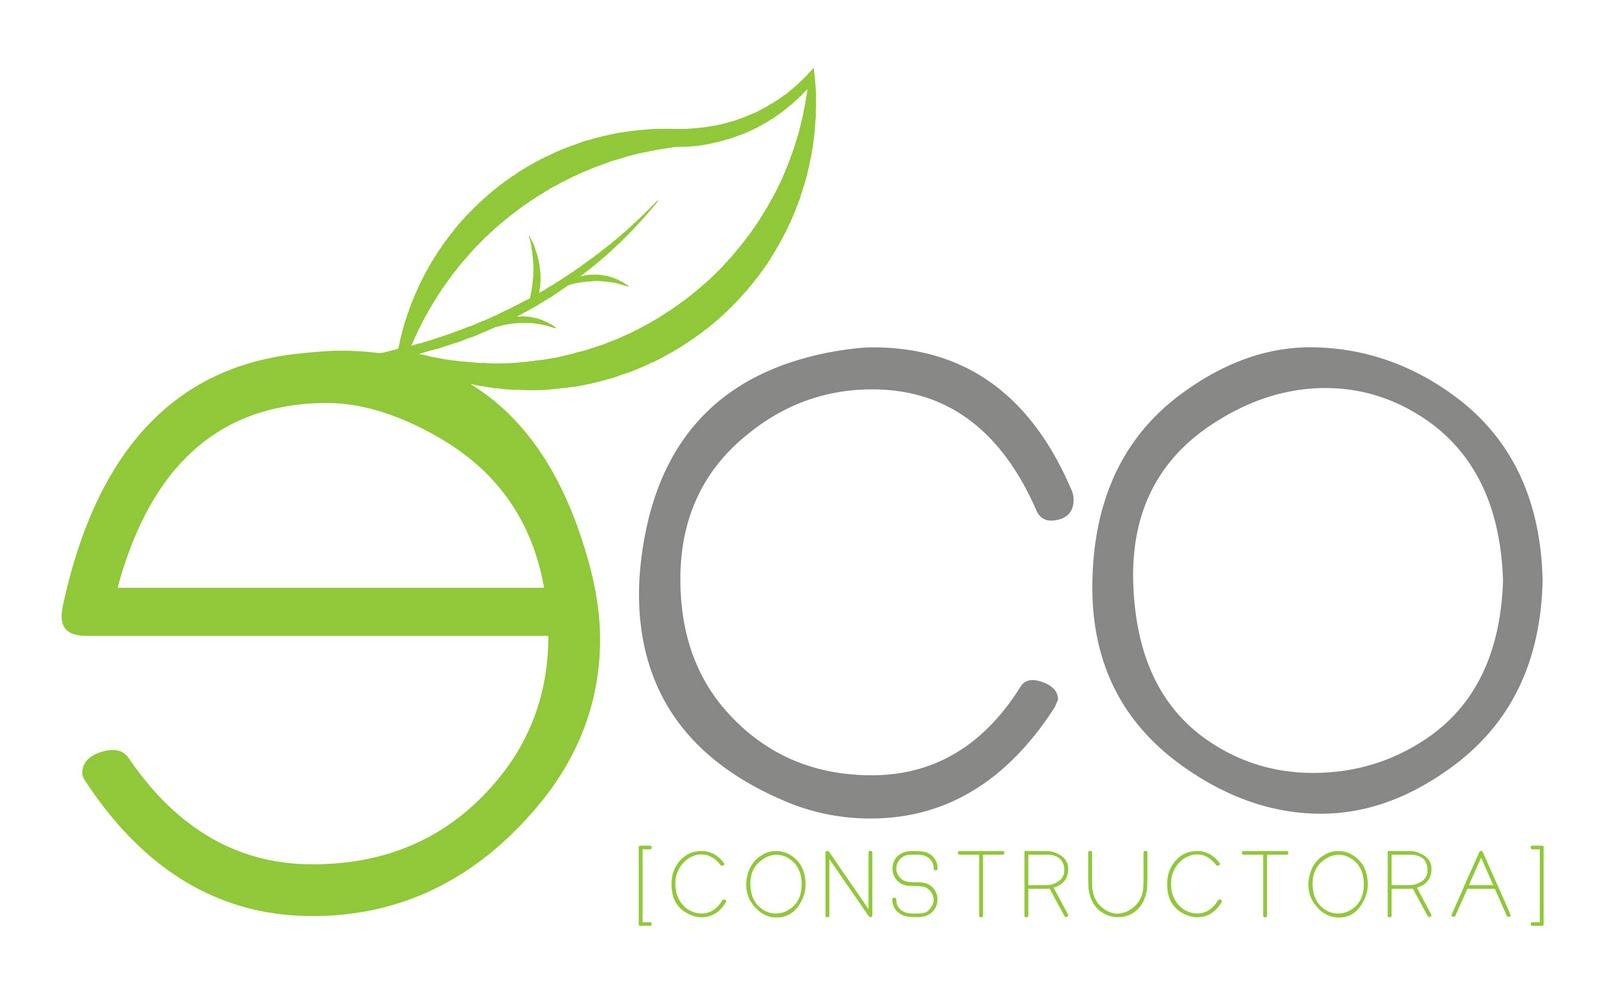 Eco constructora for Constructora